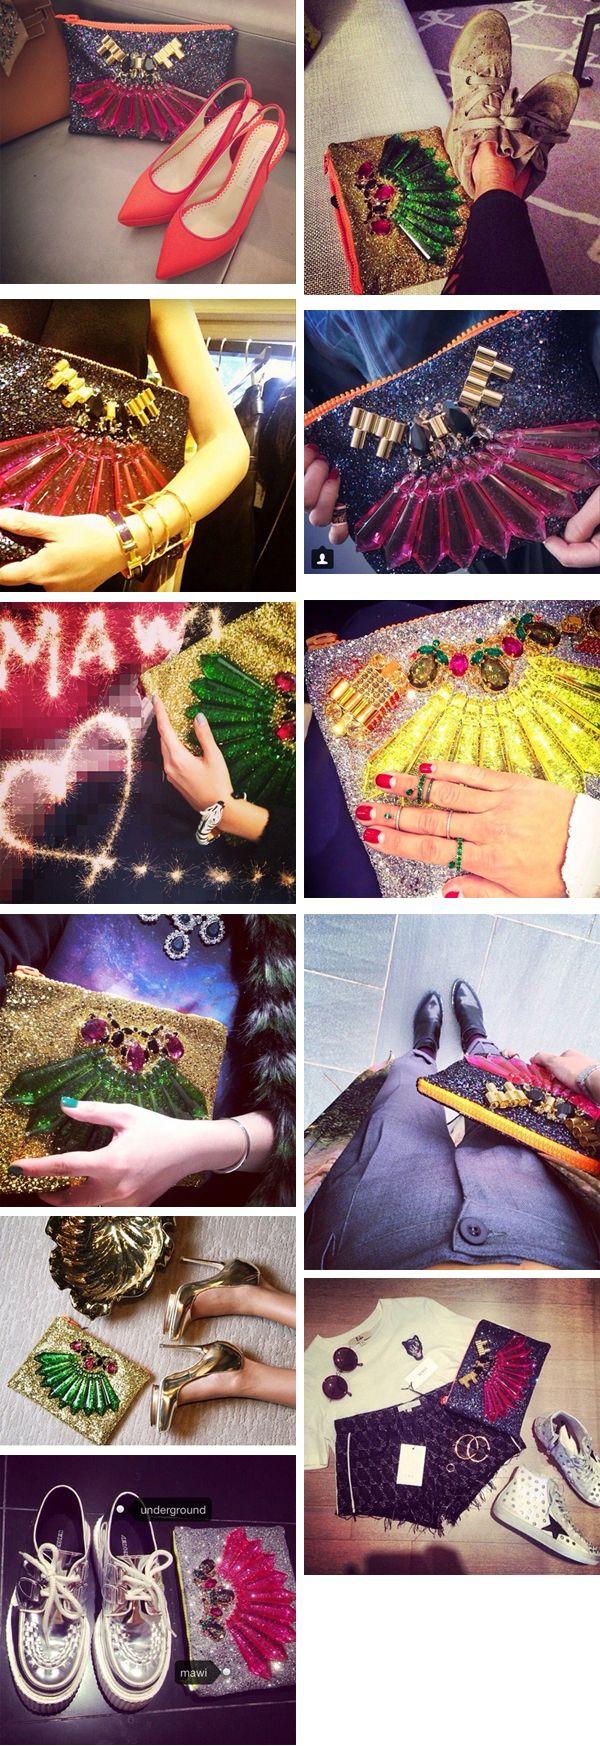 Новые 2015 Мода Марка MAWI драгоценный сумки партии блестки клатчи кристалл оболочки вечерние сумочки-inClutches из багажа и сумки на Aliexpress.com | Alibaba Group